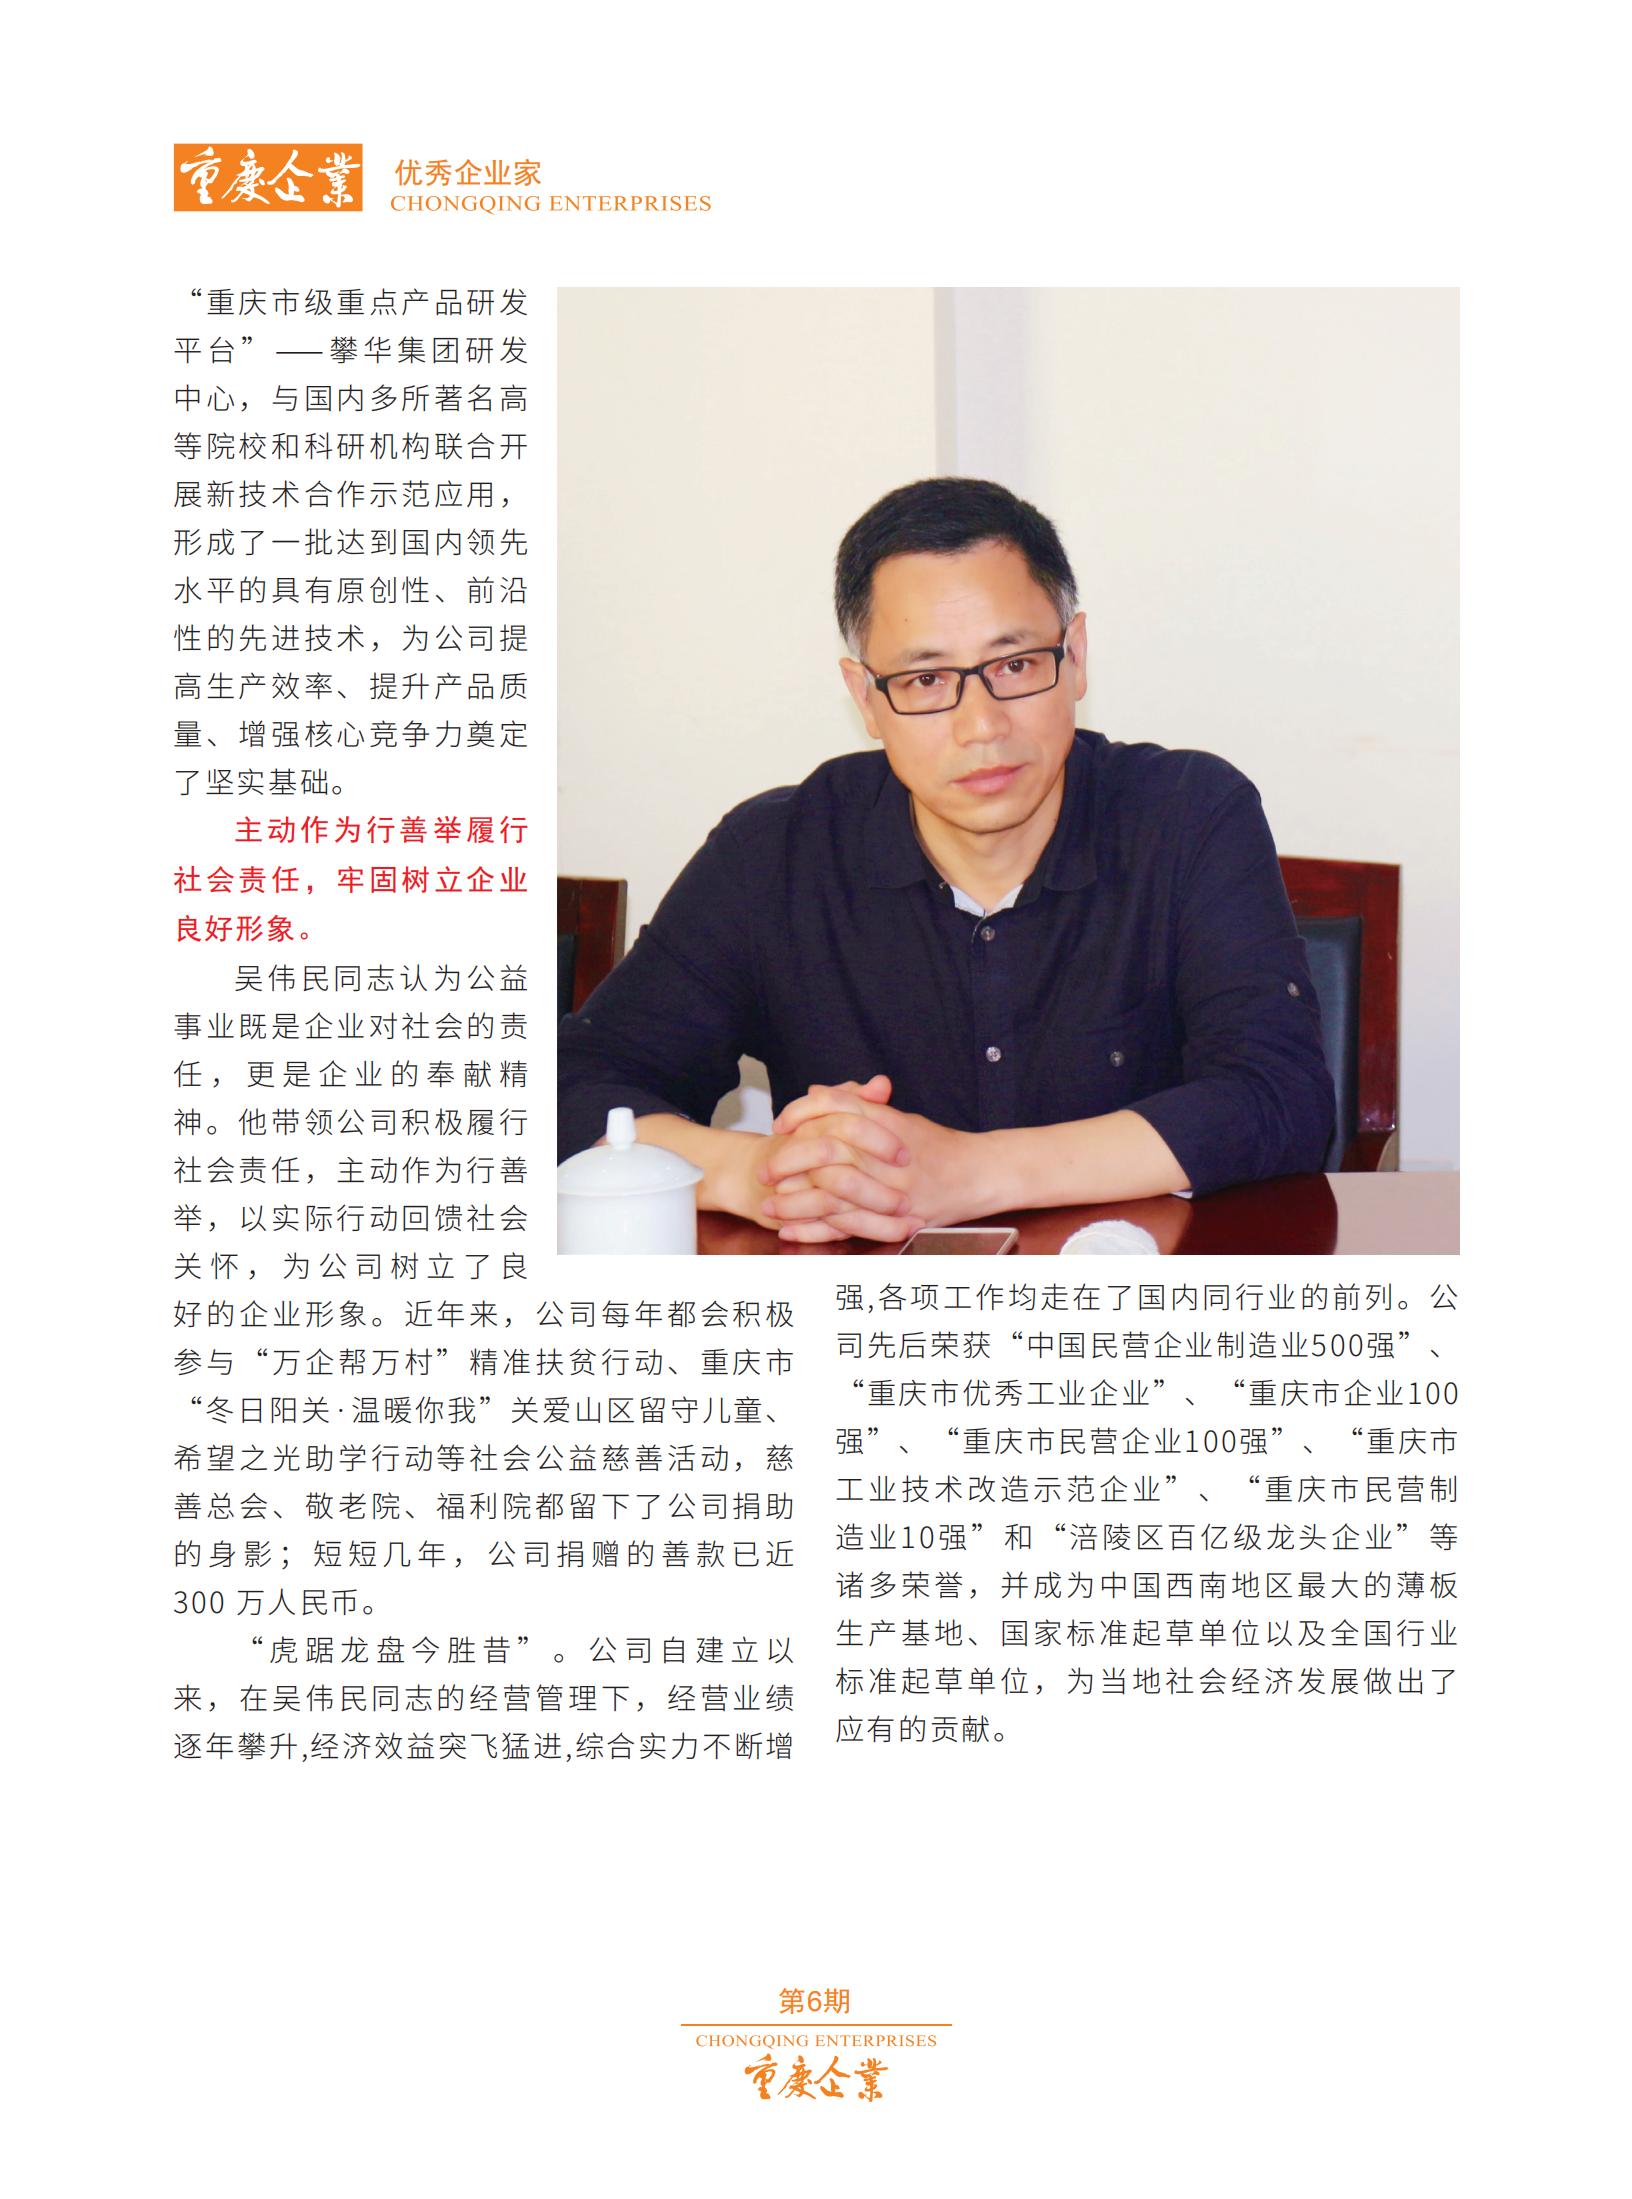 吳偉民 (2).png